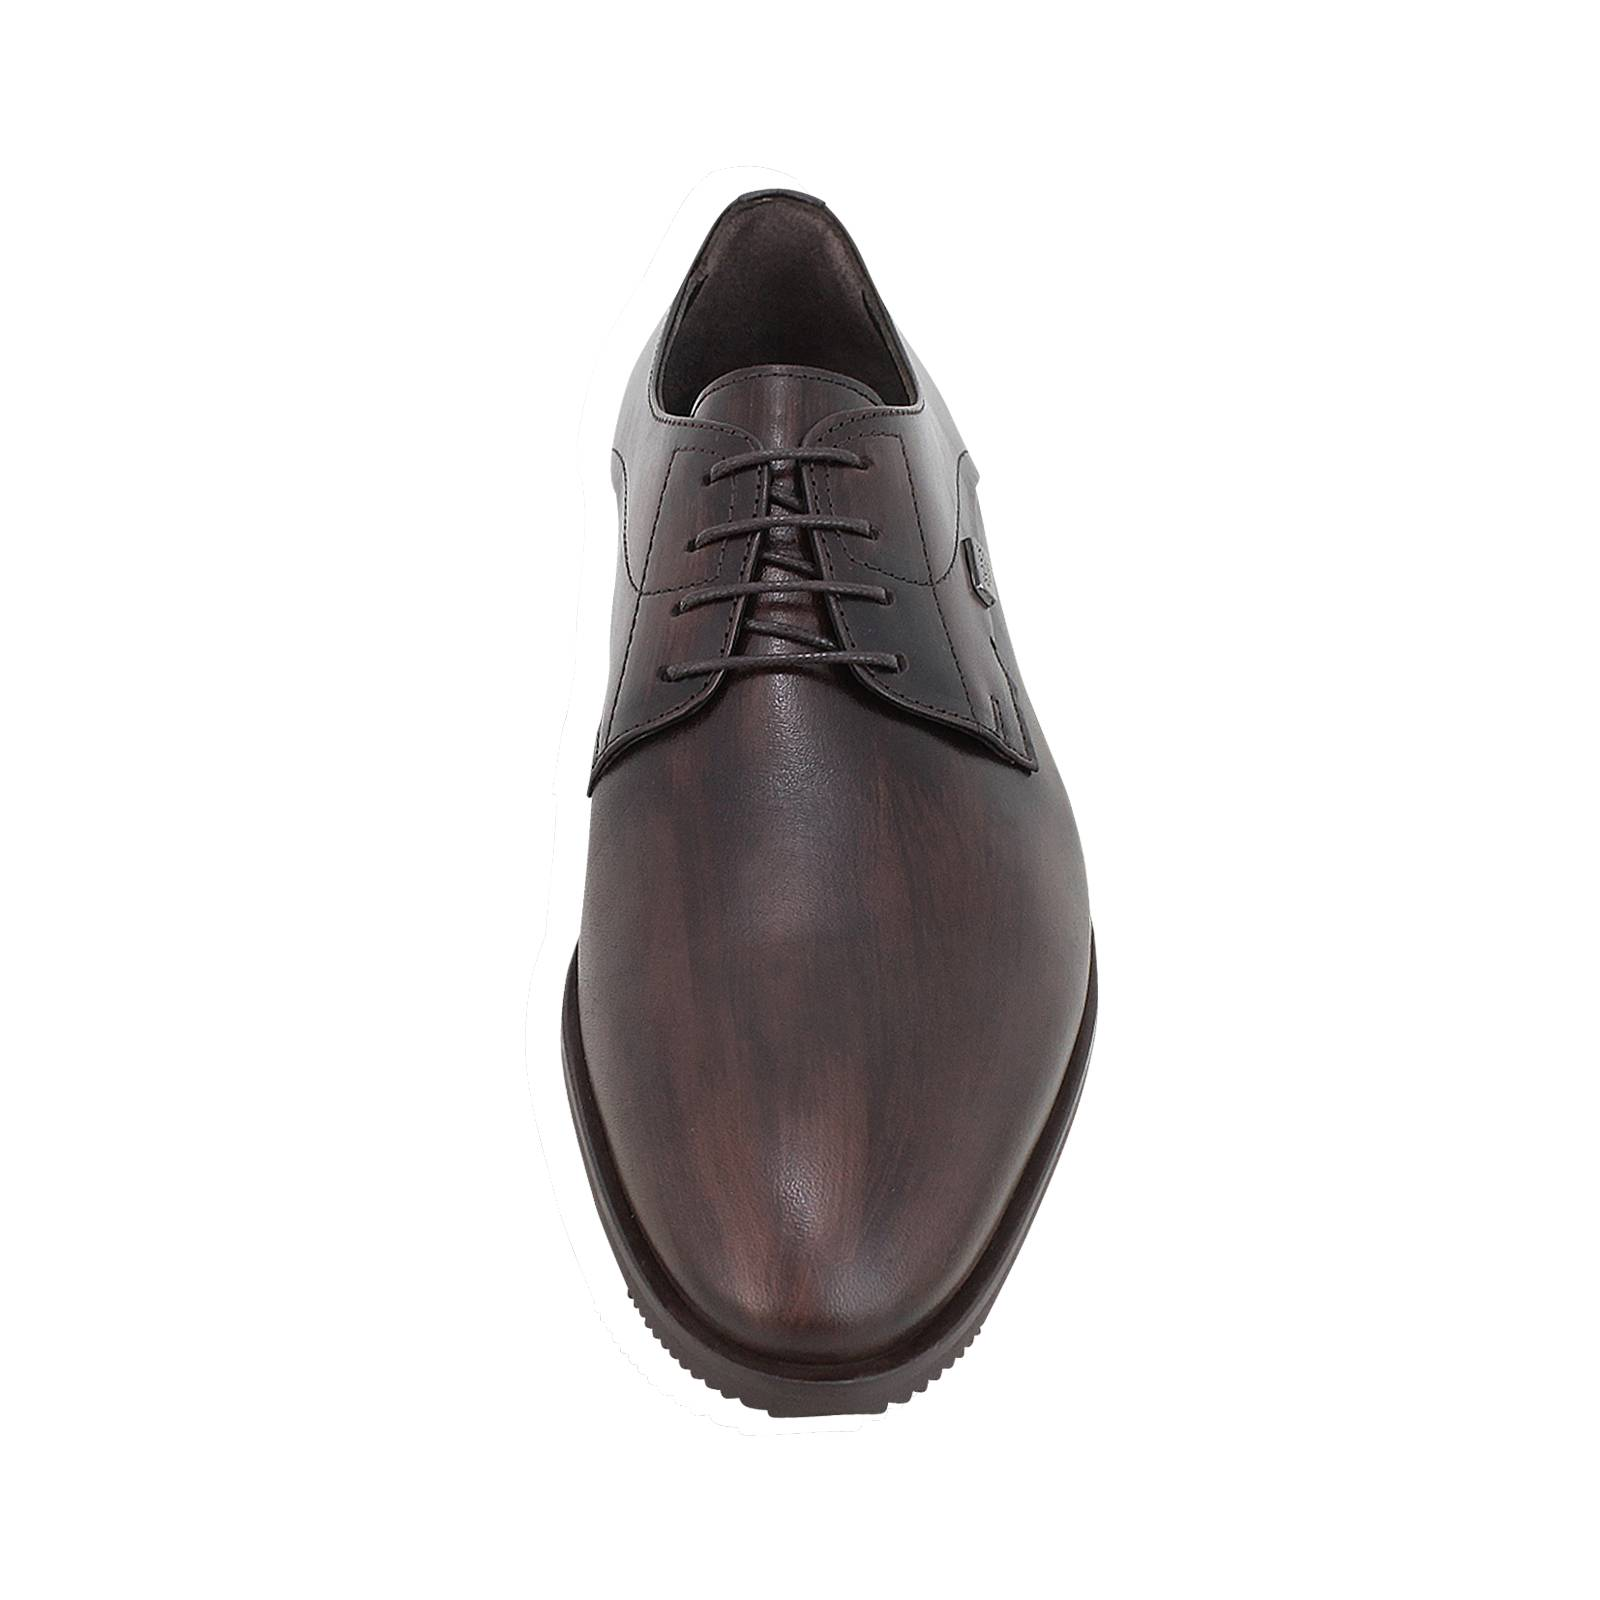 Summit - Ανδρικά δετά παπούτσια Boss από δέρμα - Gianna Kazakou Online 7f110df68eb